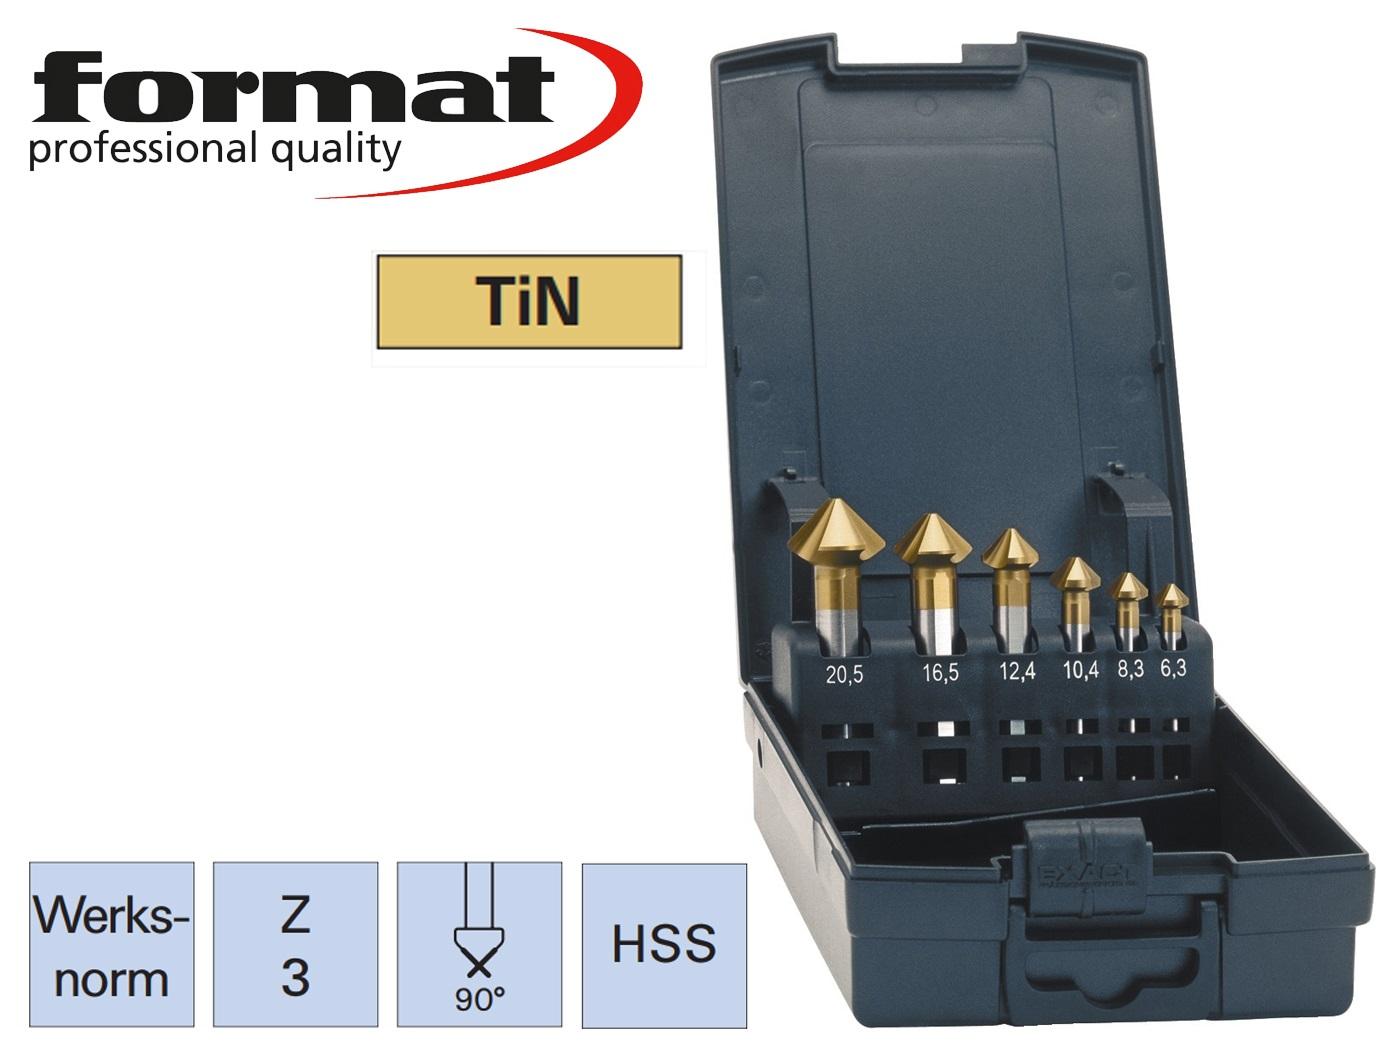 verzinkboor set DIN 335C HSS TiN ADVANCED exact | DKMTools - DKM Tools